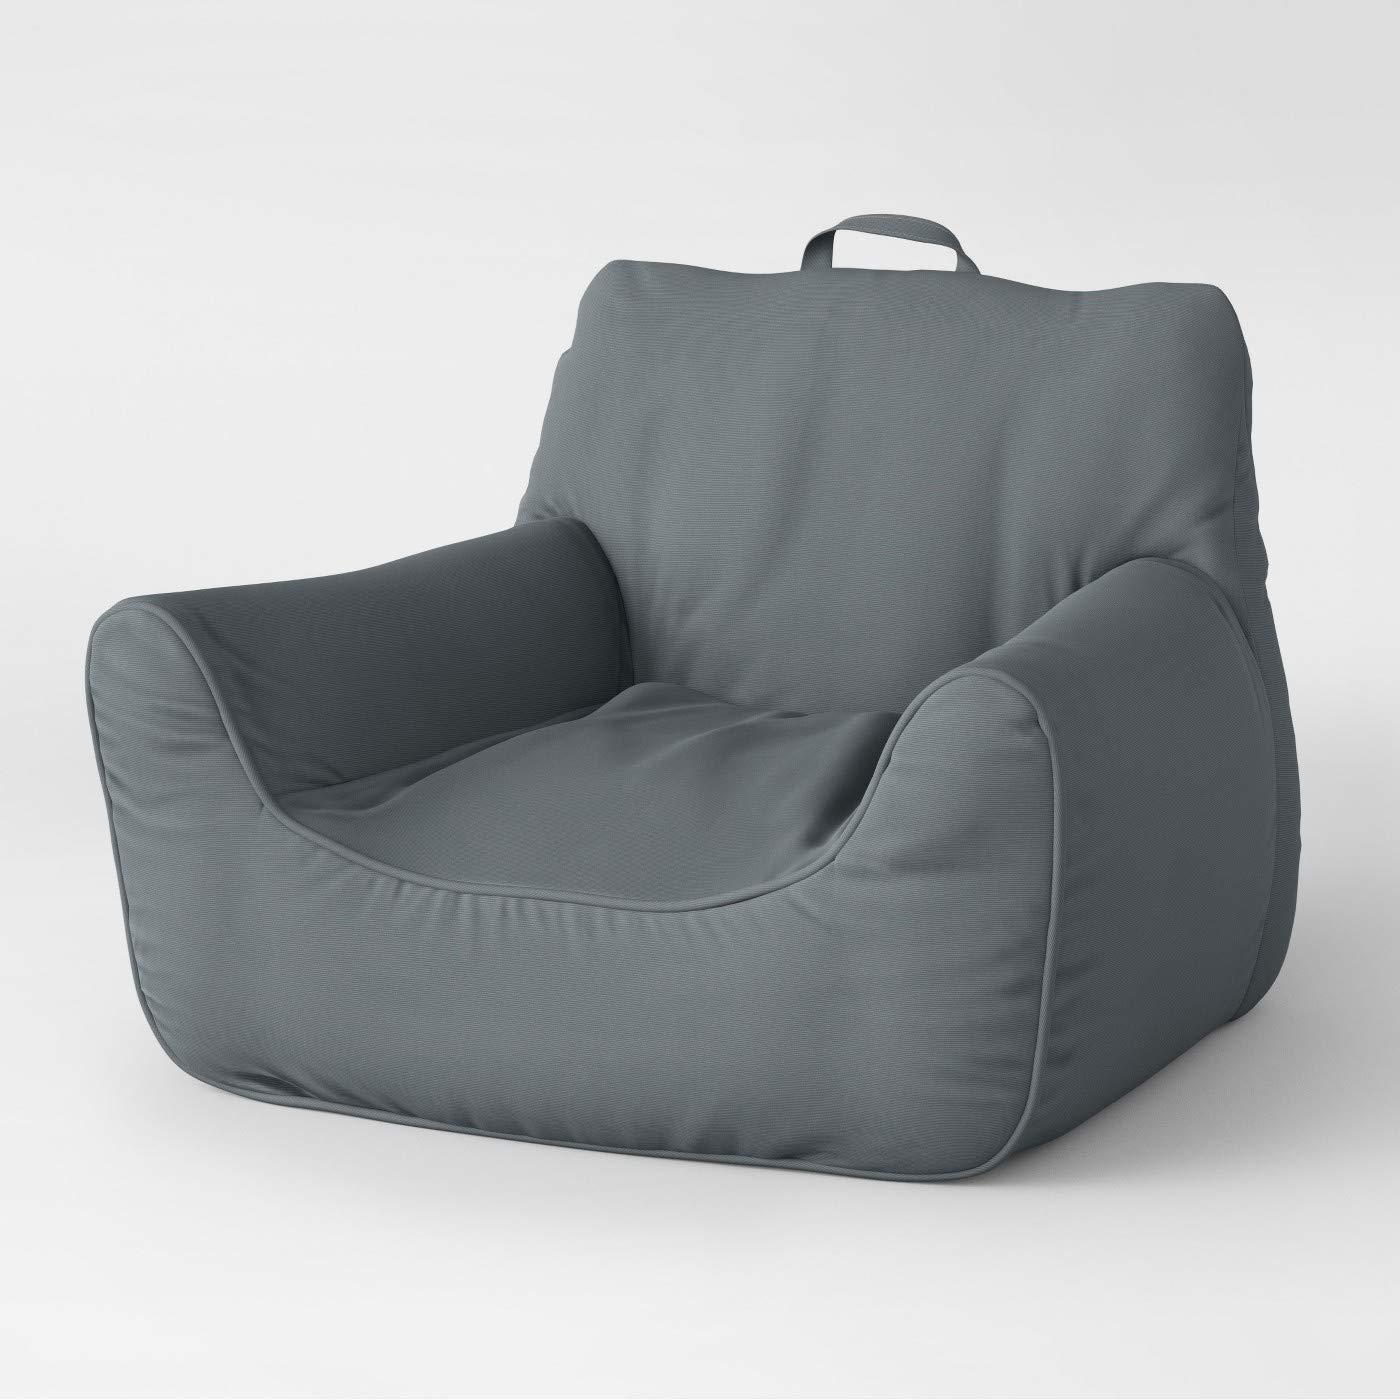 Excellent Amazon Com Pillowfort Gray Structured Large Bean Bag Chair Machost Co Dining Chair Design Ideas Machostcouk